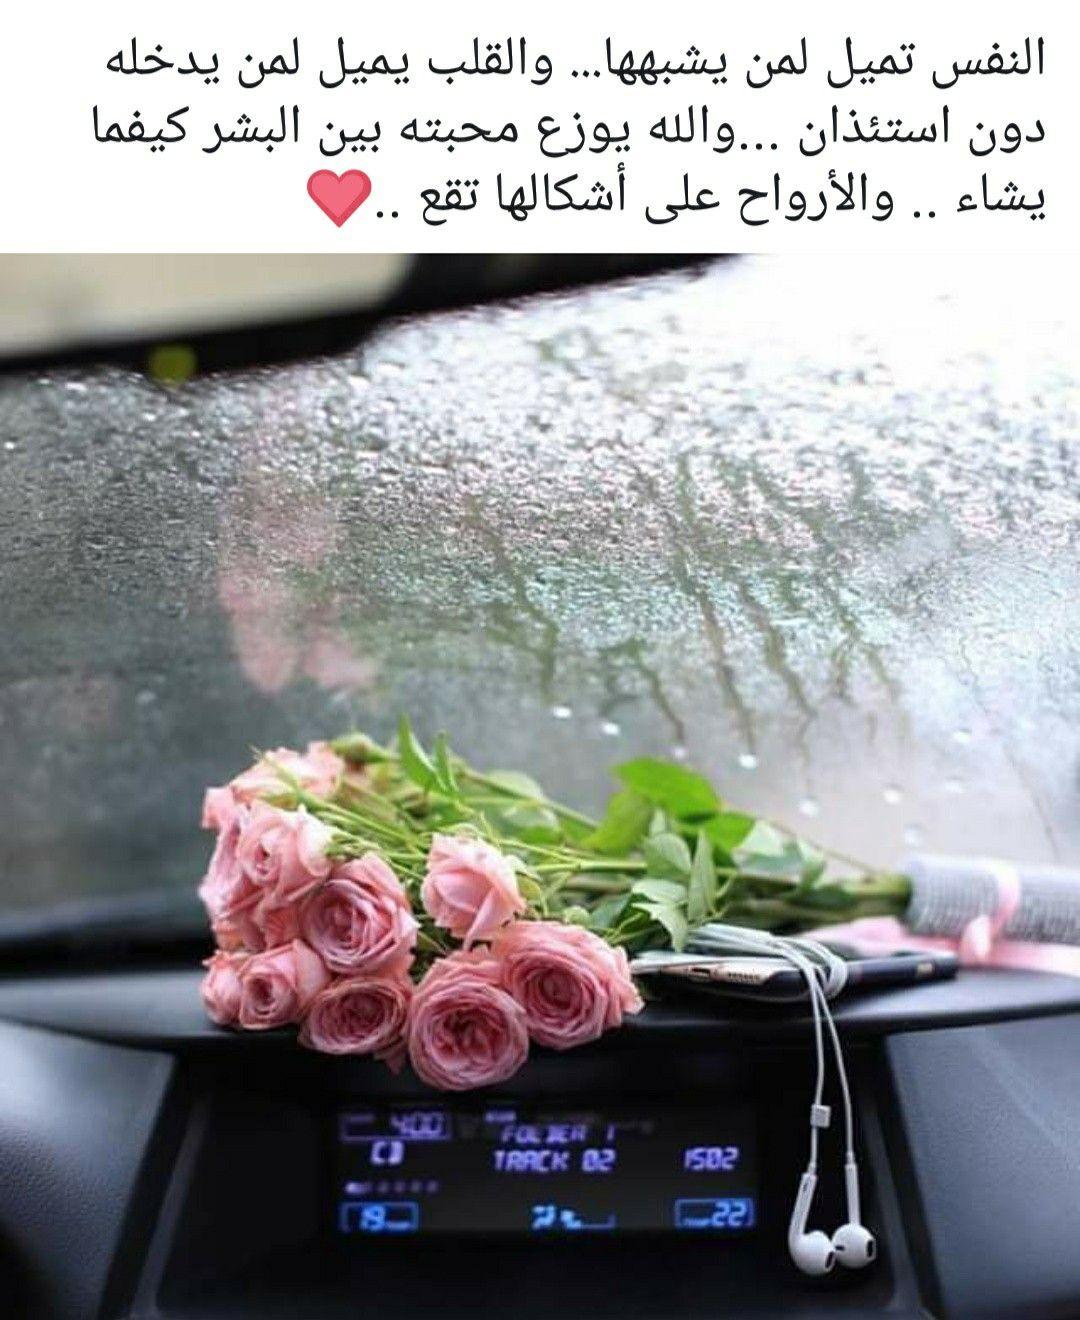 القلب يميل لمن يدخله دون استئذان Sweet Quotes Words Quotes Arabic Quotes